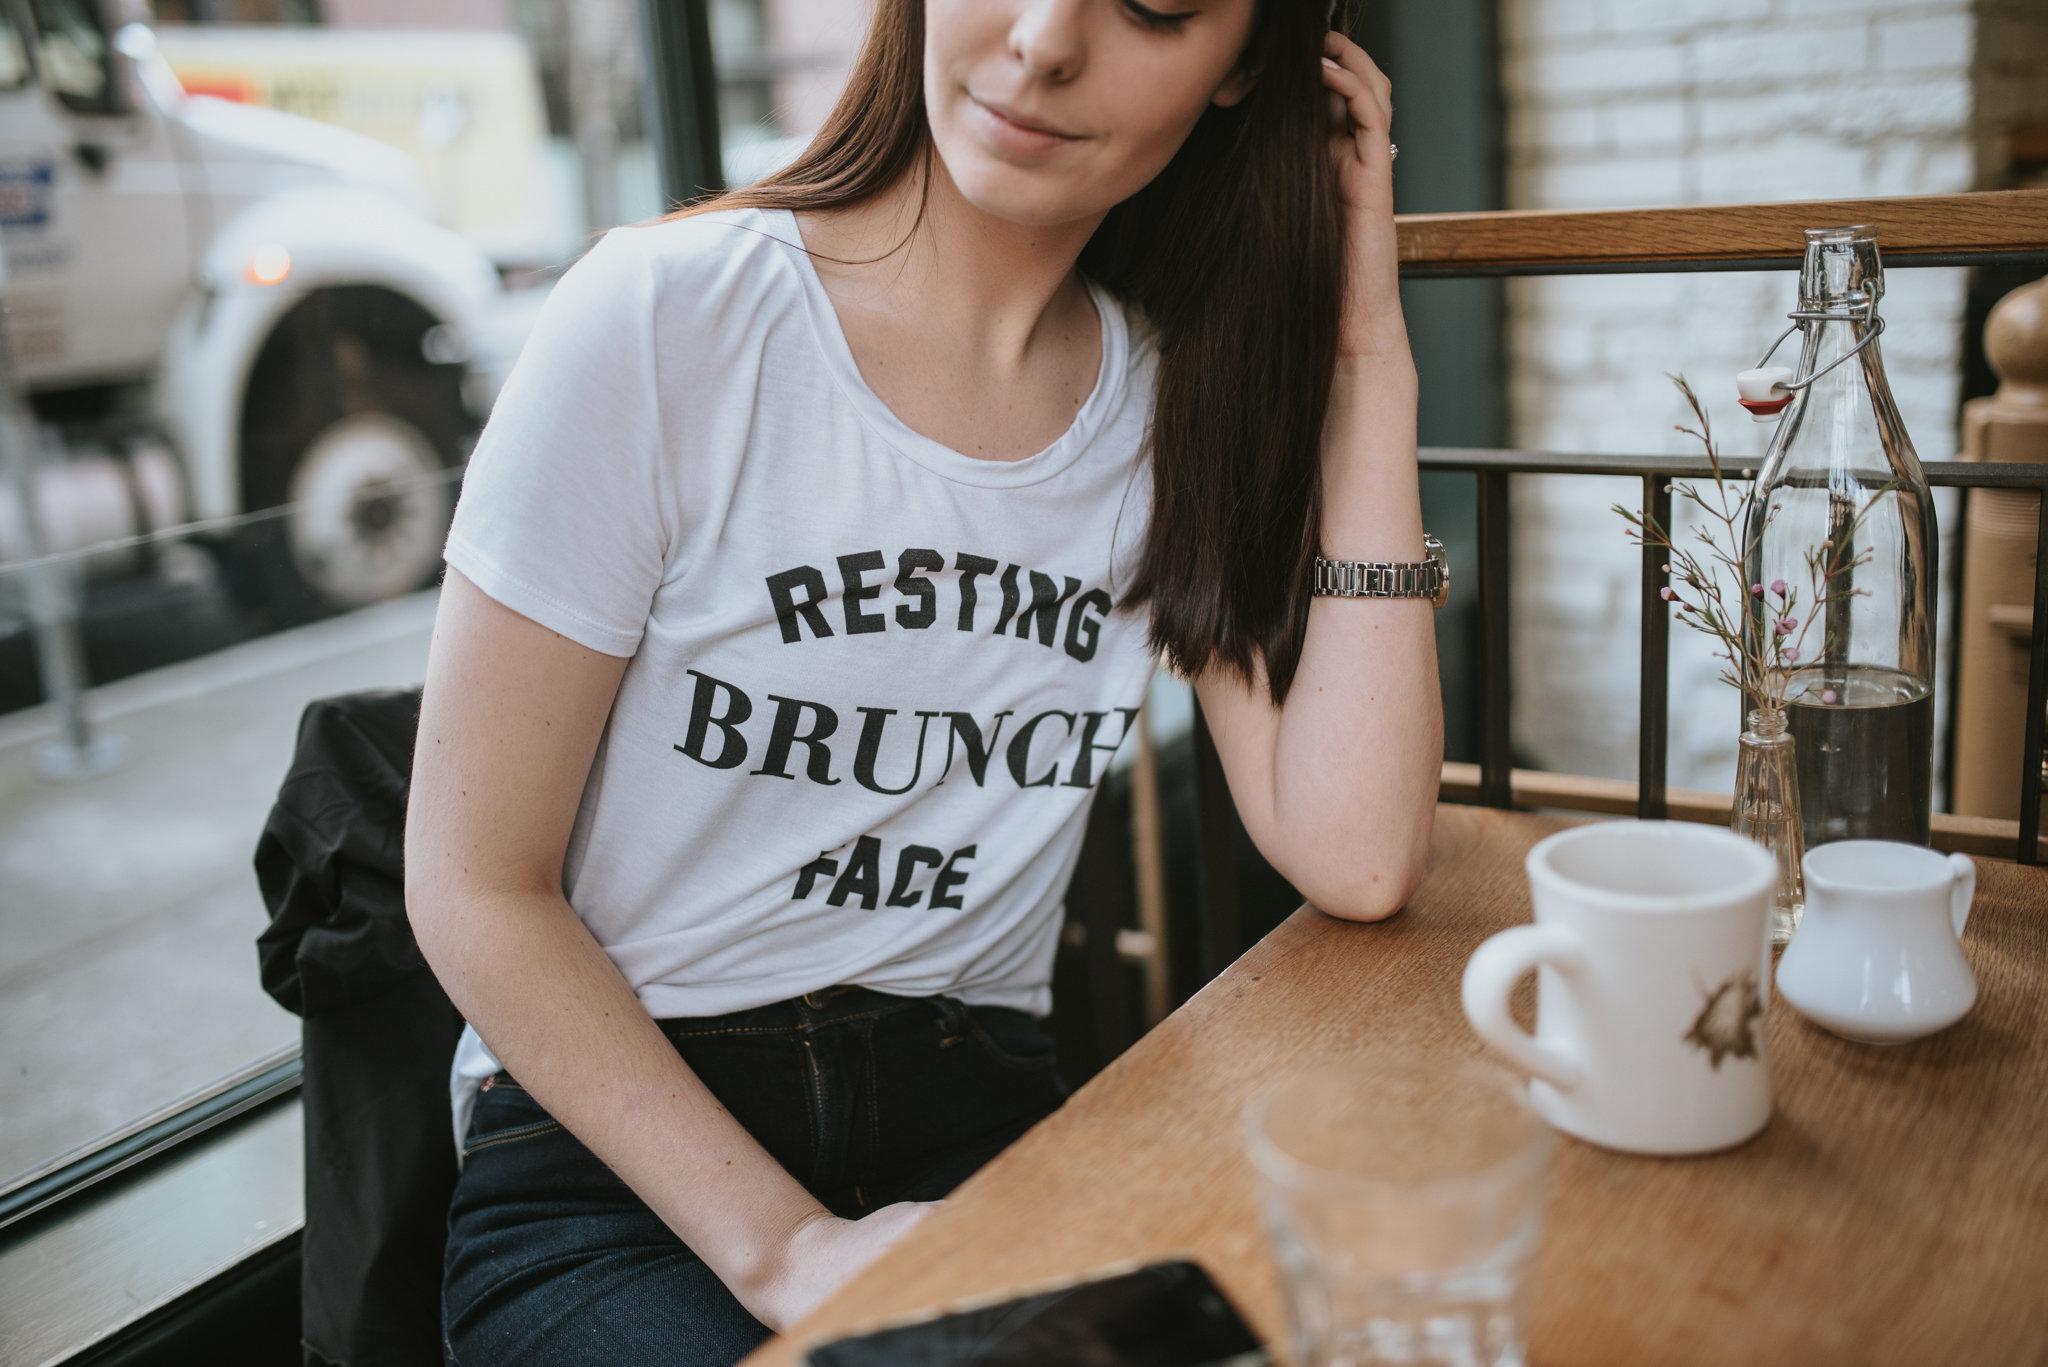 Shop-Rollick-Resting-Brunch-Face-Shirt-Seattle-streetwear